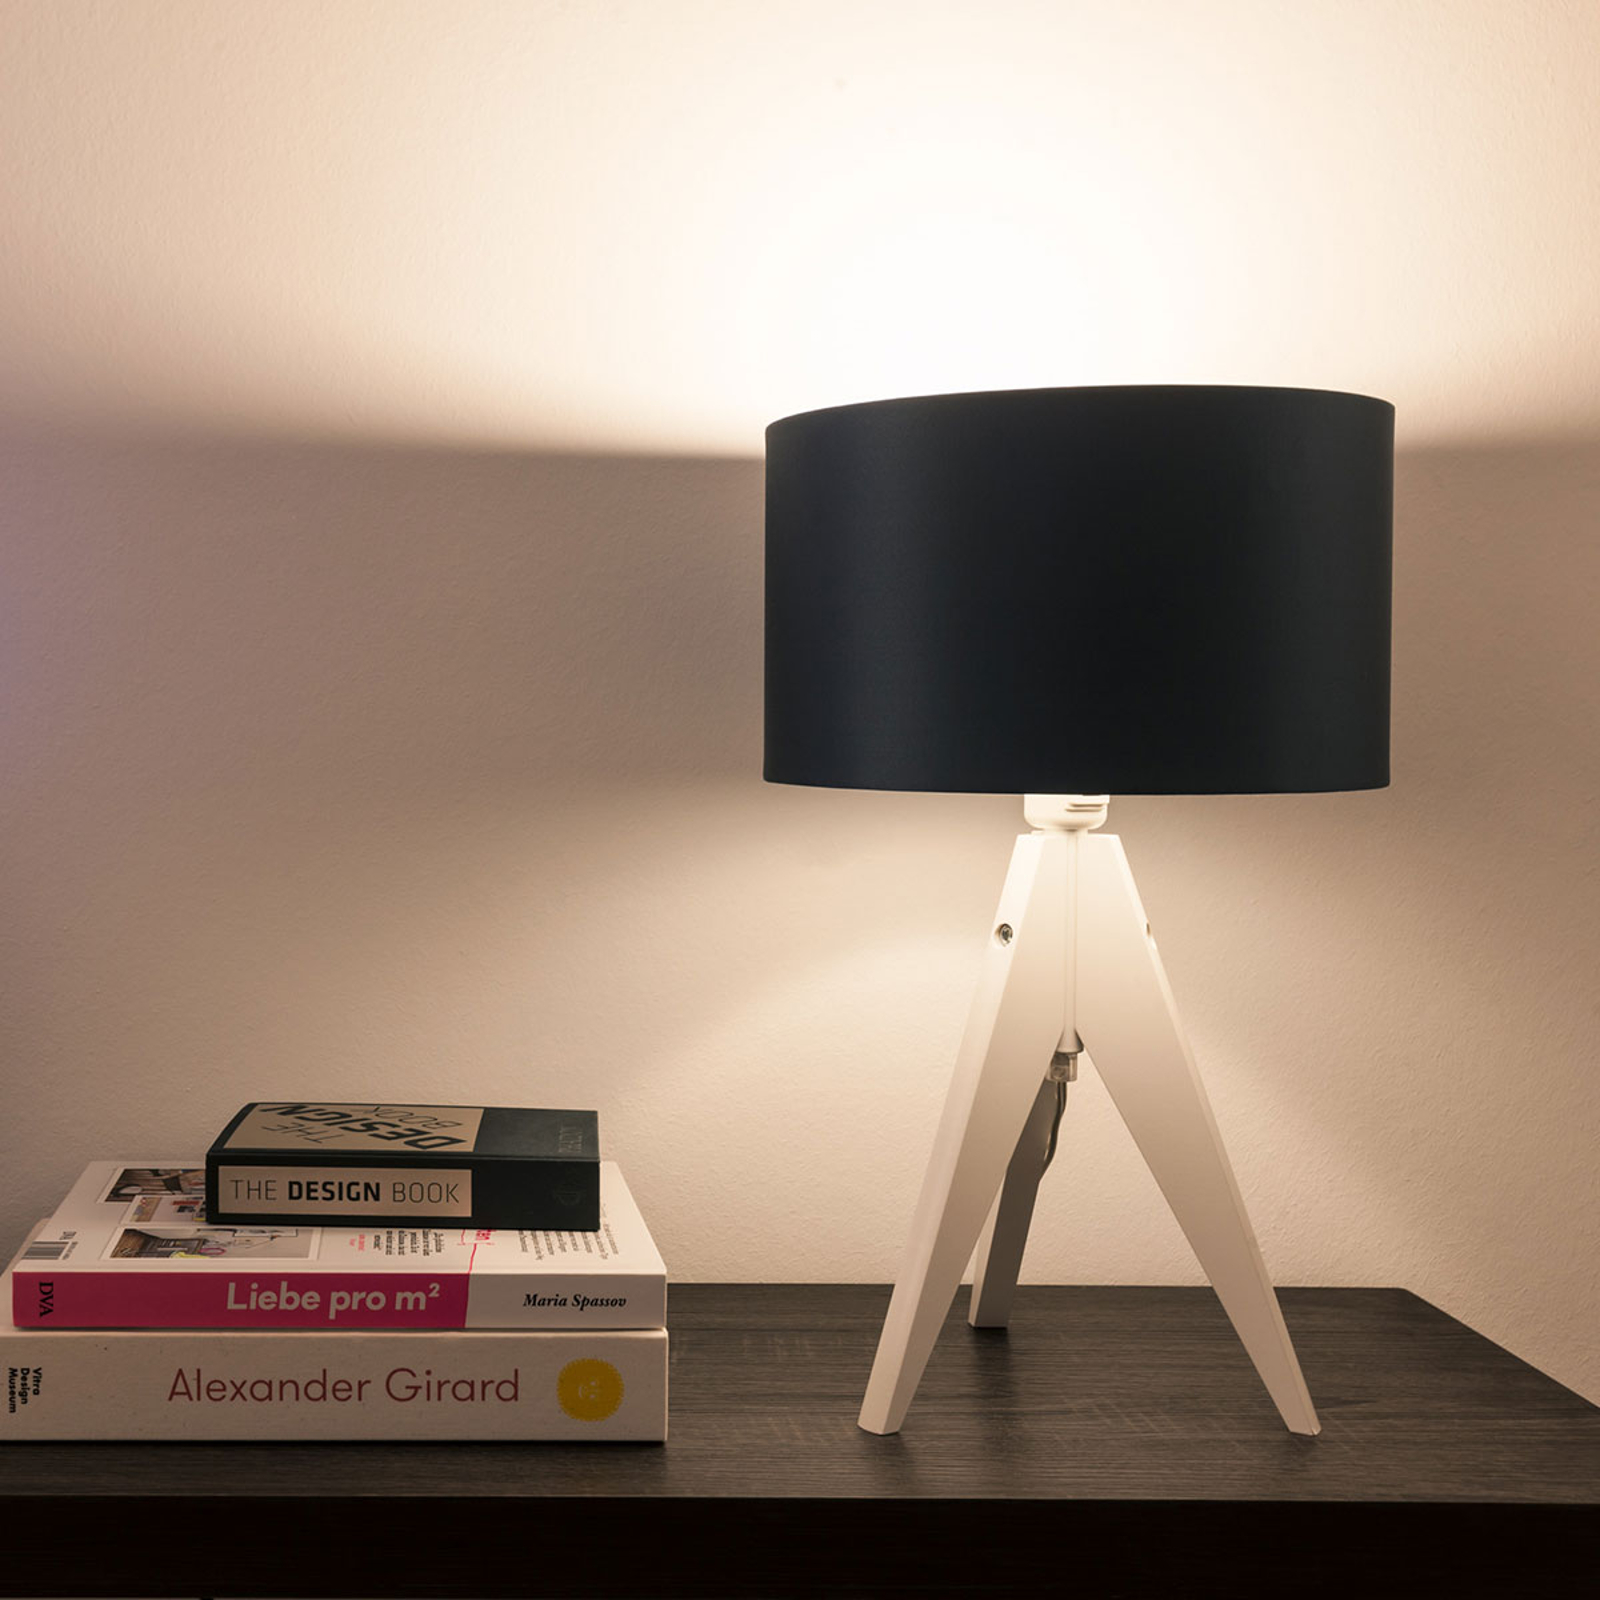 Müller Licht tint white+color LED-Lampe E27 9,5W